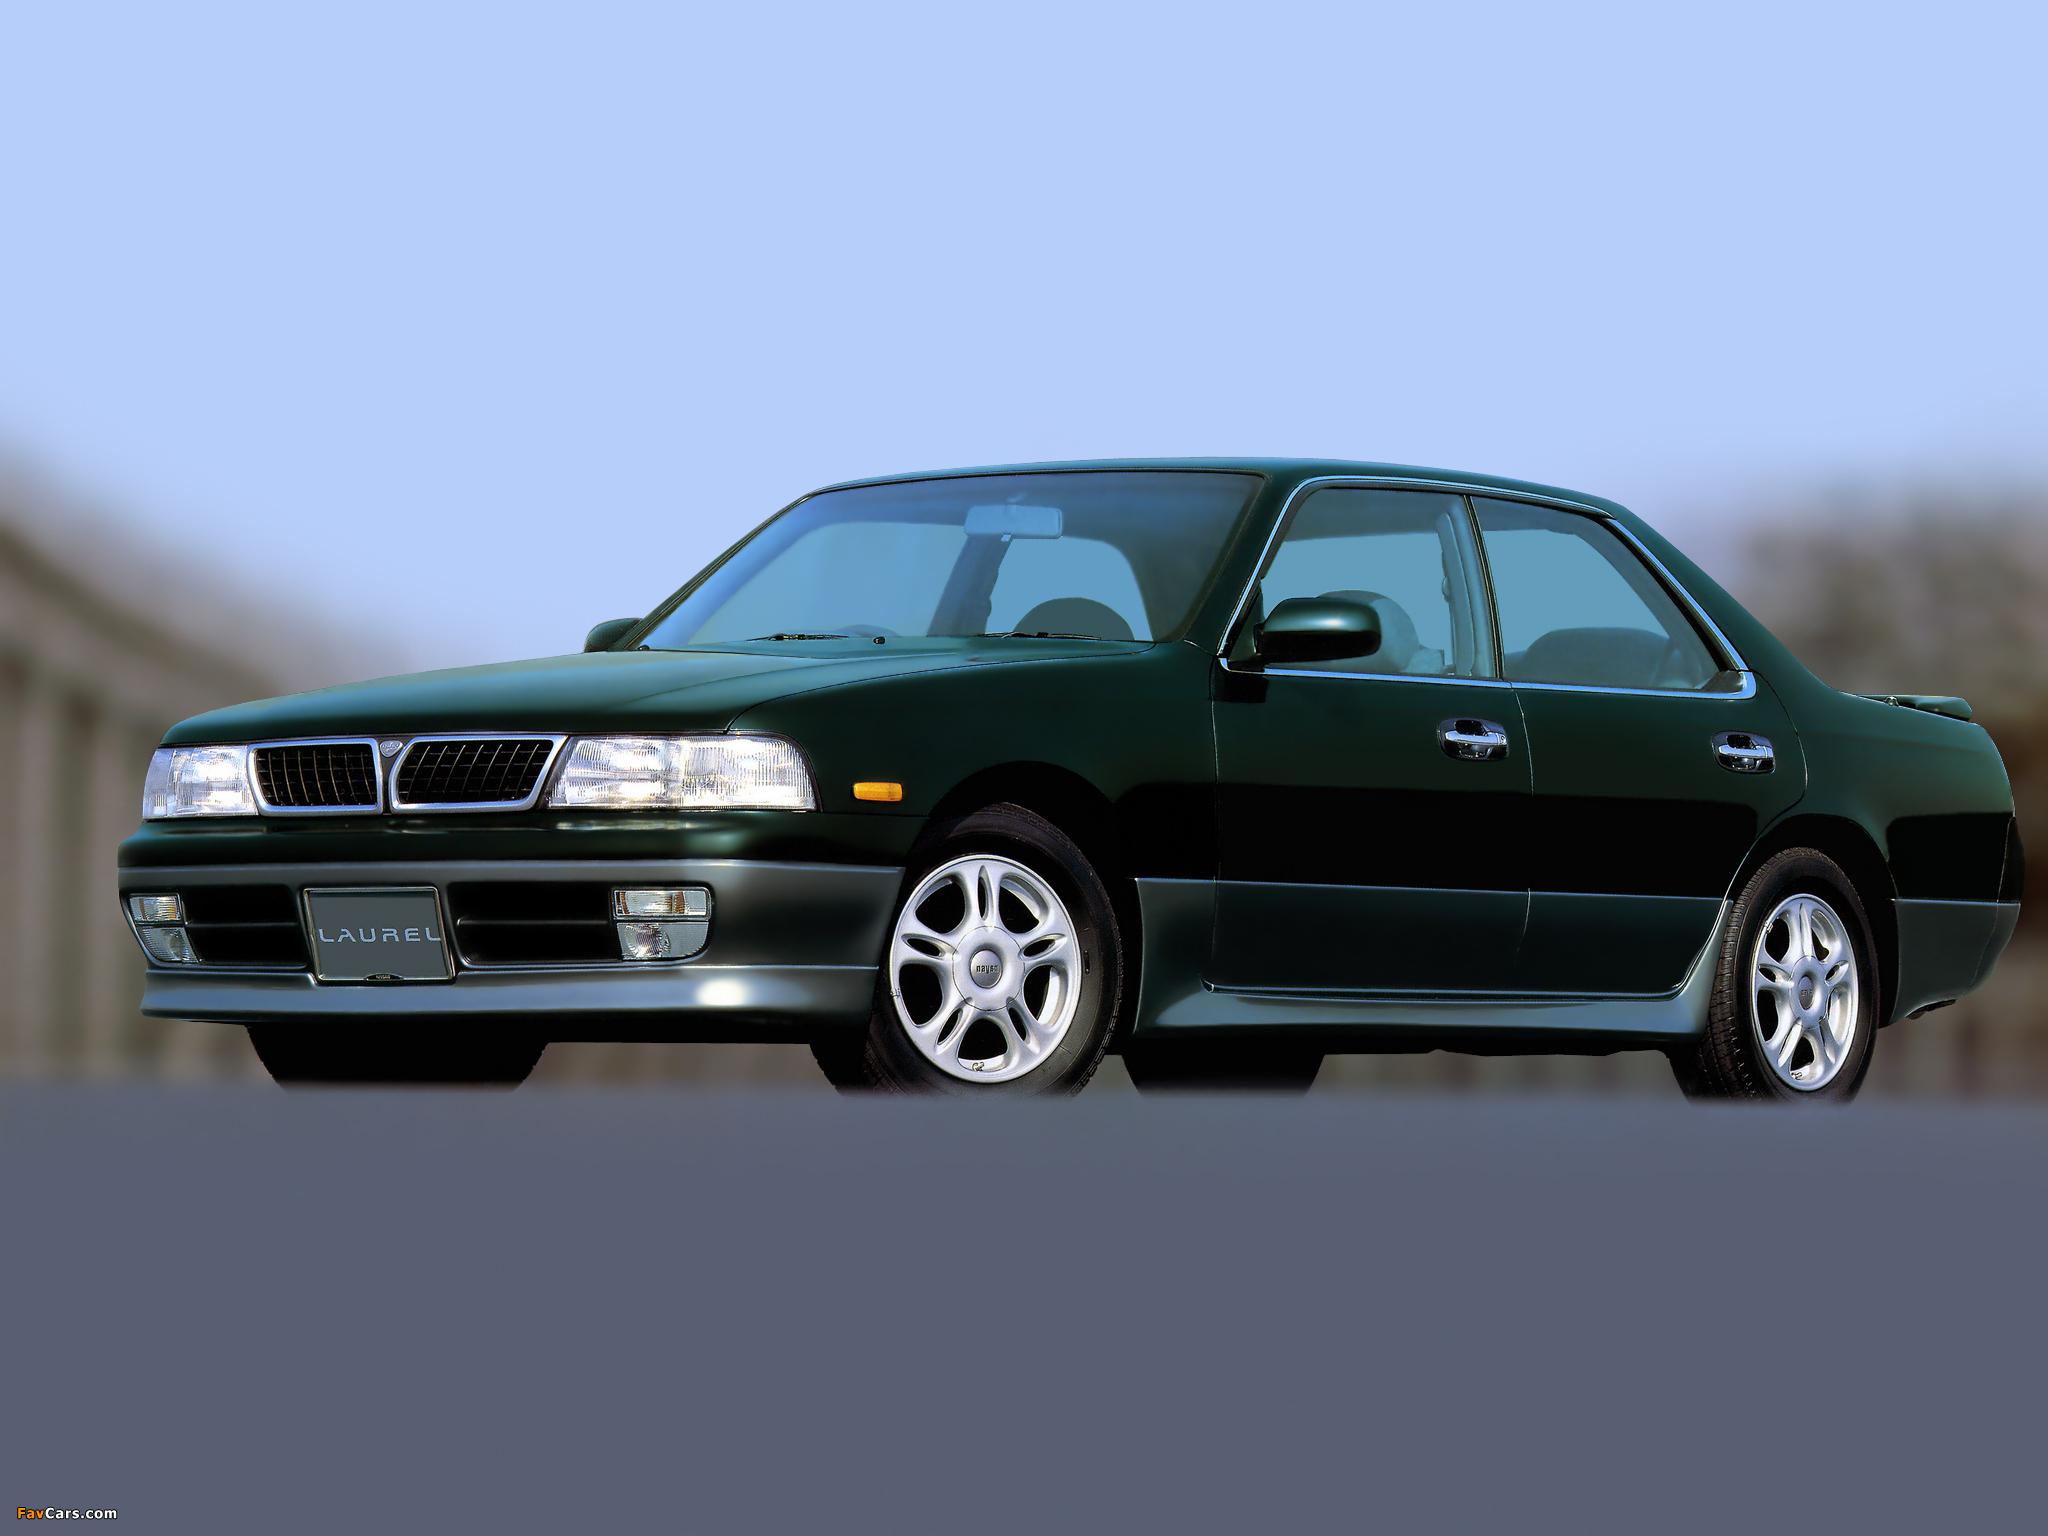 Nissan Laurel Club S (C34) 1993–94 wallpapers (2048 x 1536)